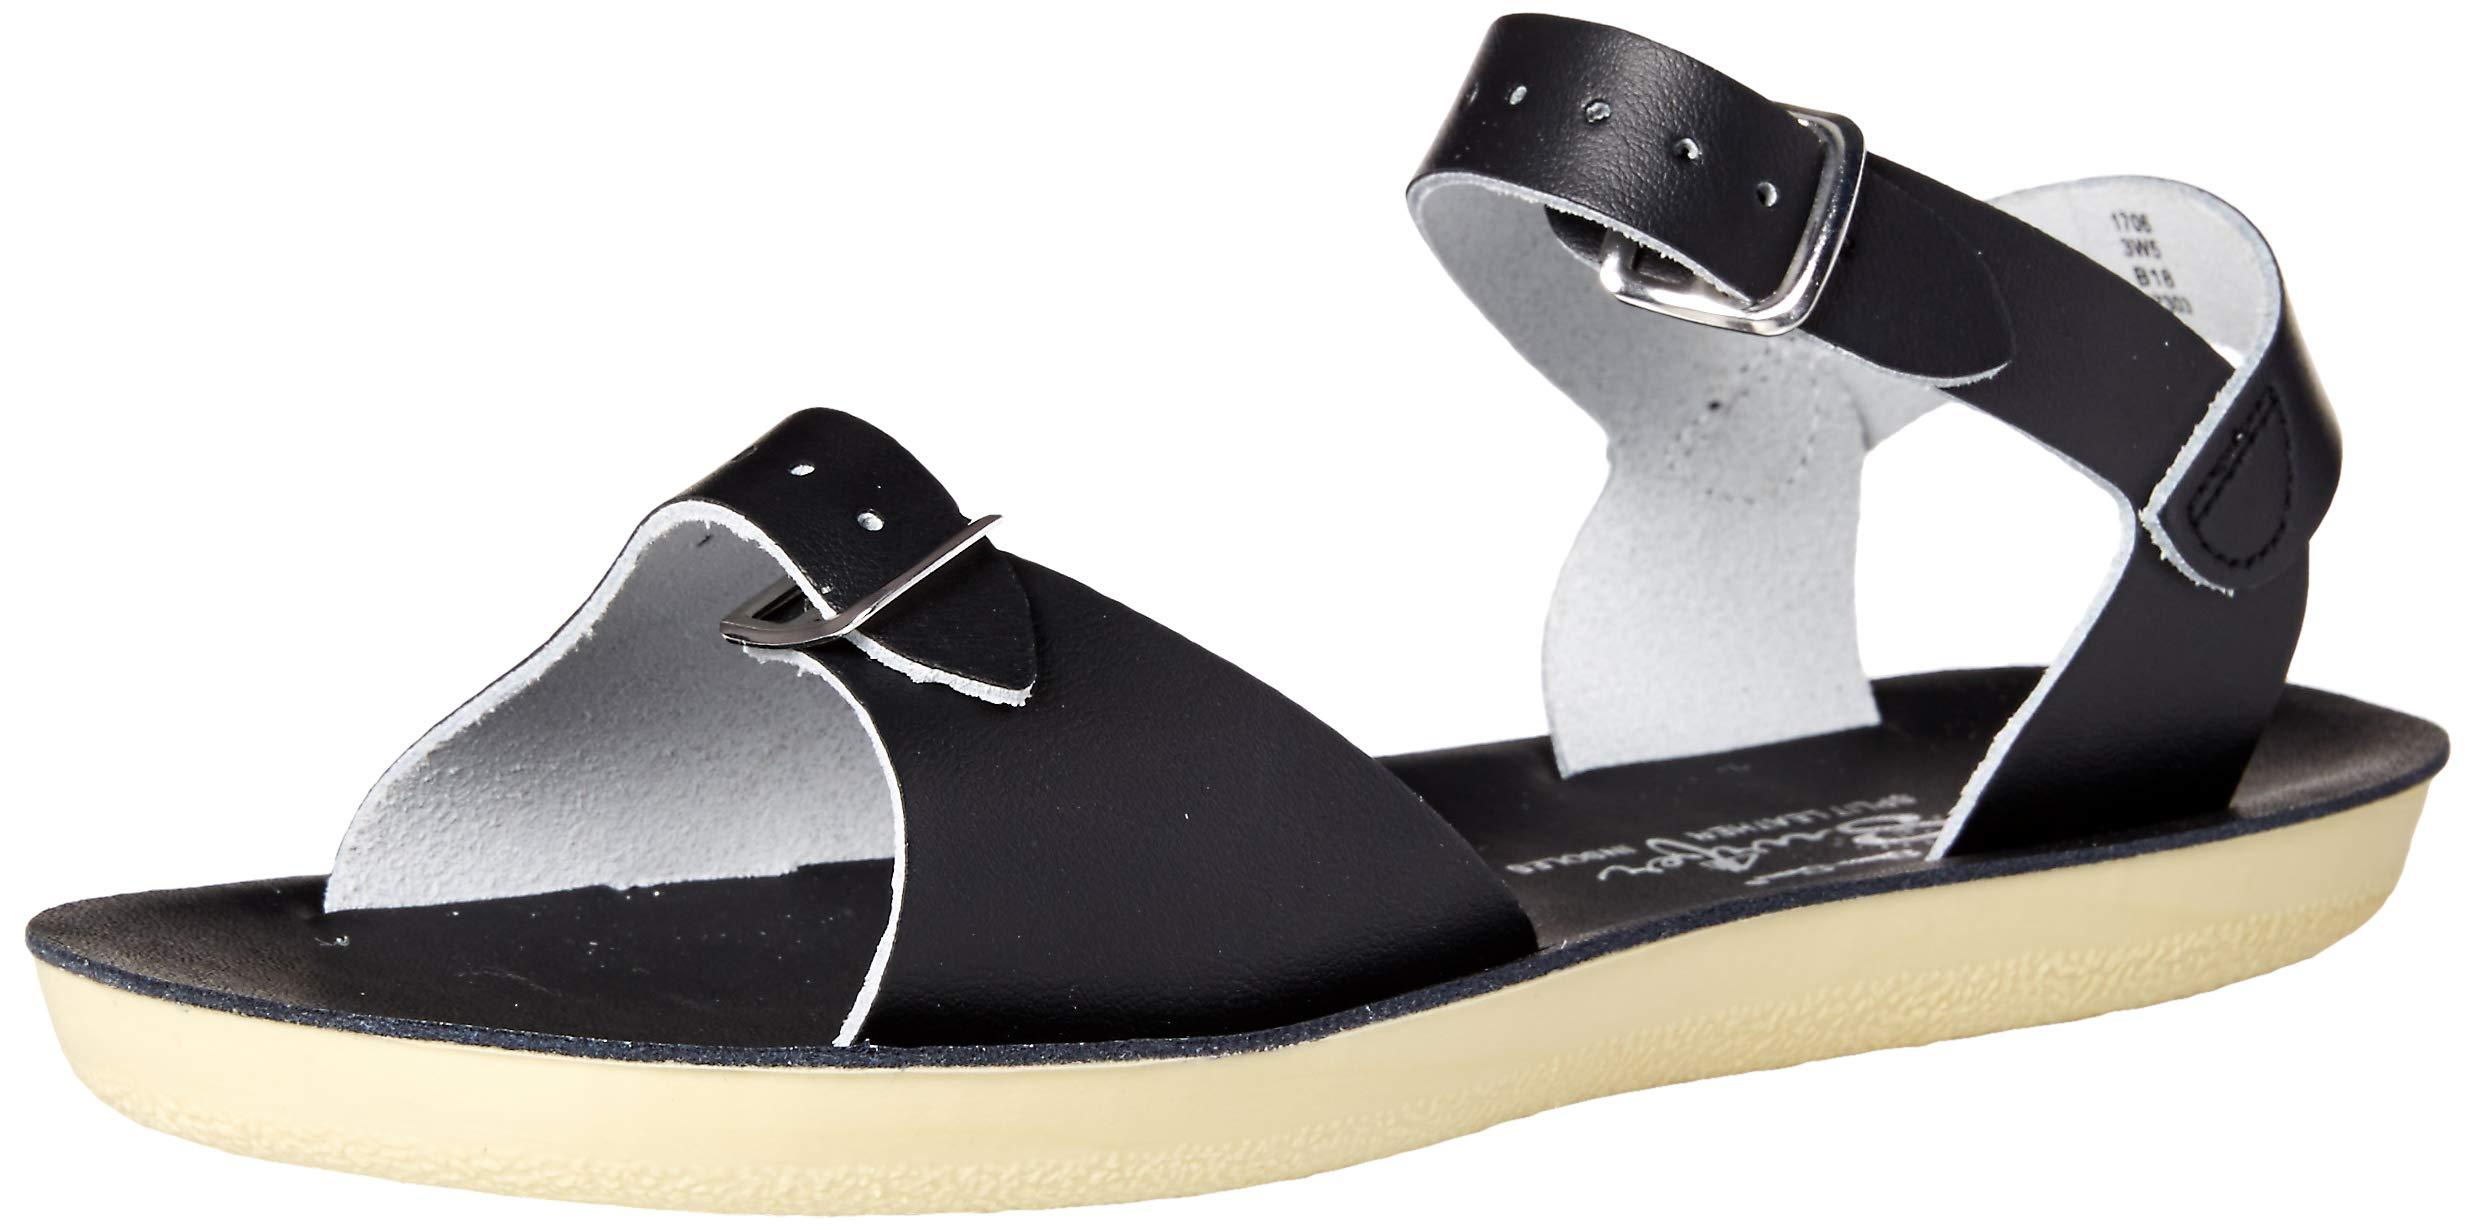 Salt Water Sandals by Hoy Shoe Baby Sun-San Surfer Flat Sandal, Black, 9 M US Toddler by Salt Water Sandals